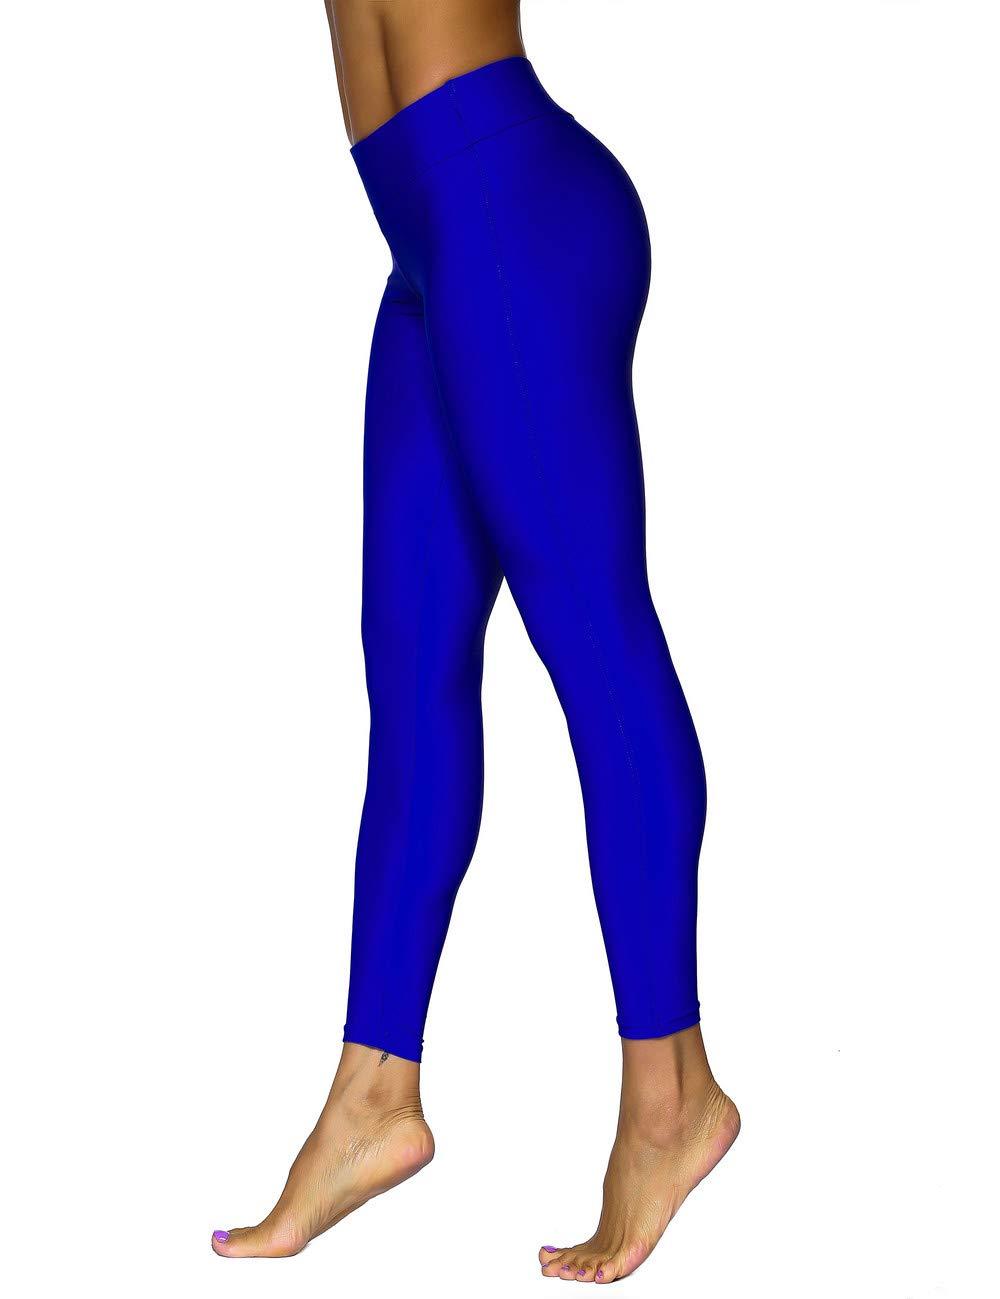 ninovino Women's Swimming Pants UPF 50+ Stretch High Waist Flex Capri Blue US20 by ninovino